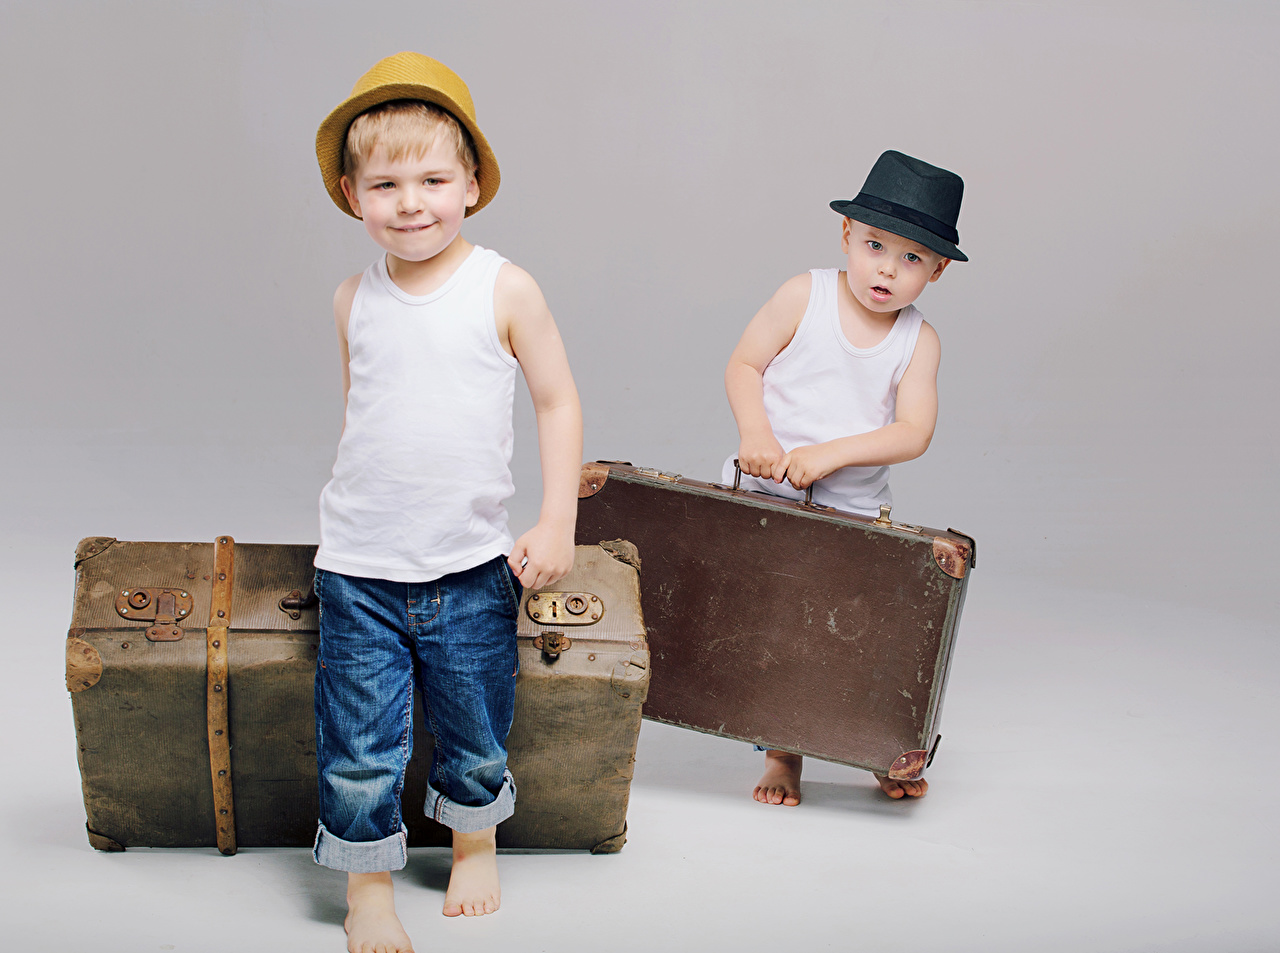 Photo Boys Children 2 Hat Jeans Suitcase Sleeveless shirt child Two Singlet